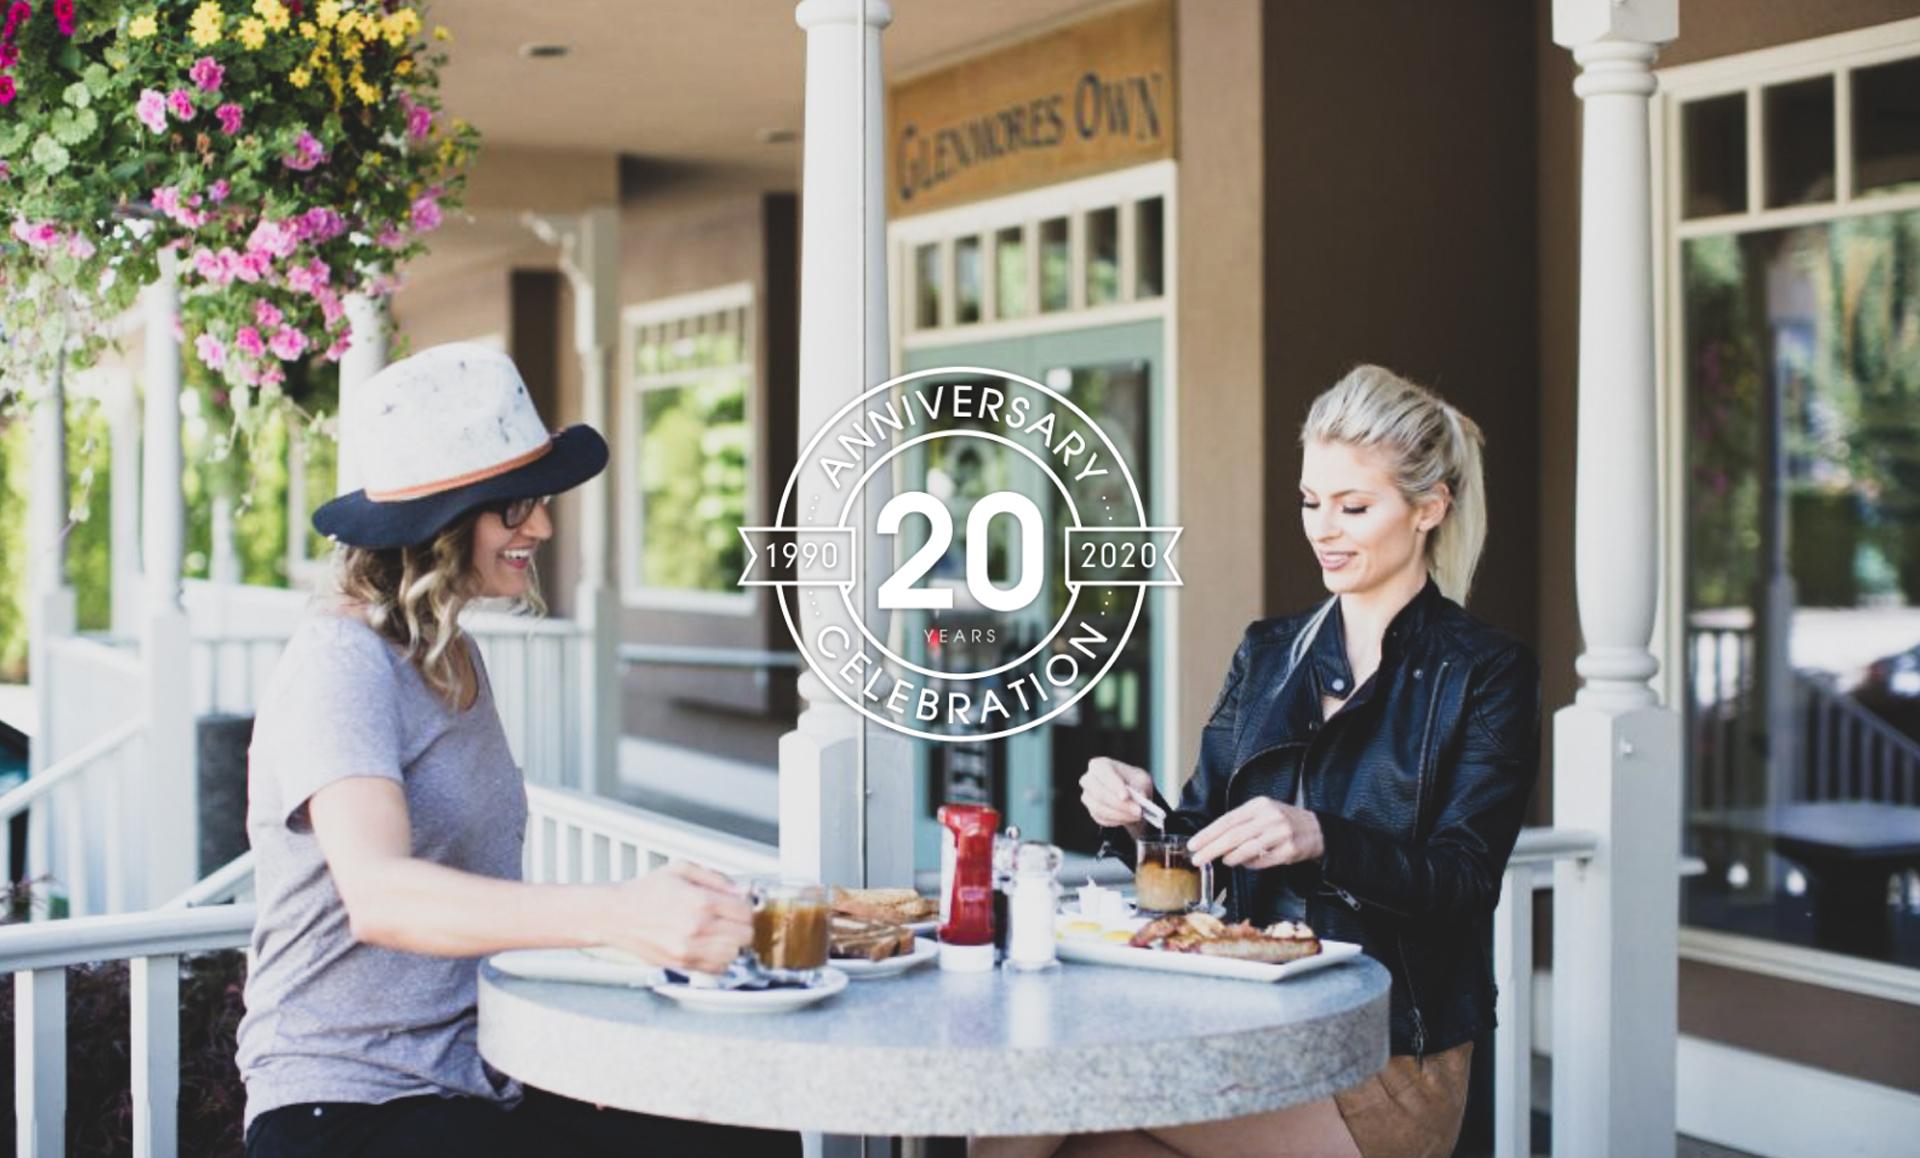 restaurant marketing brandts creek 20th anniversary